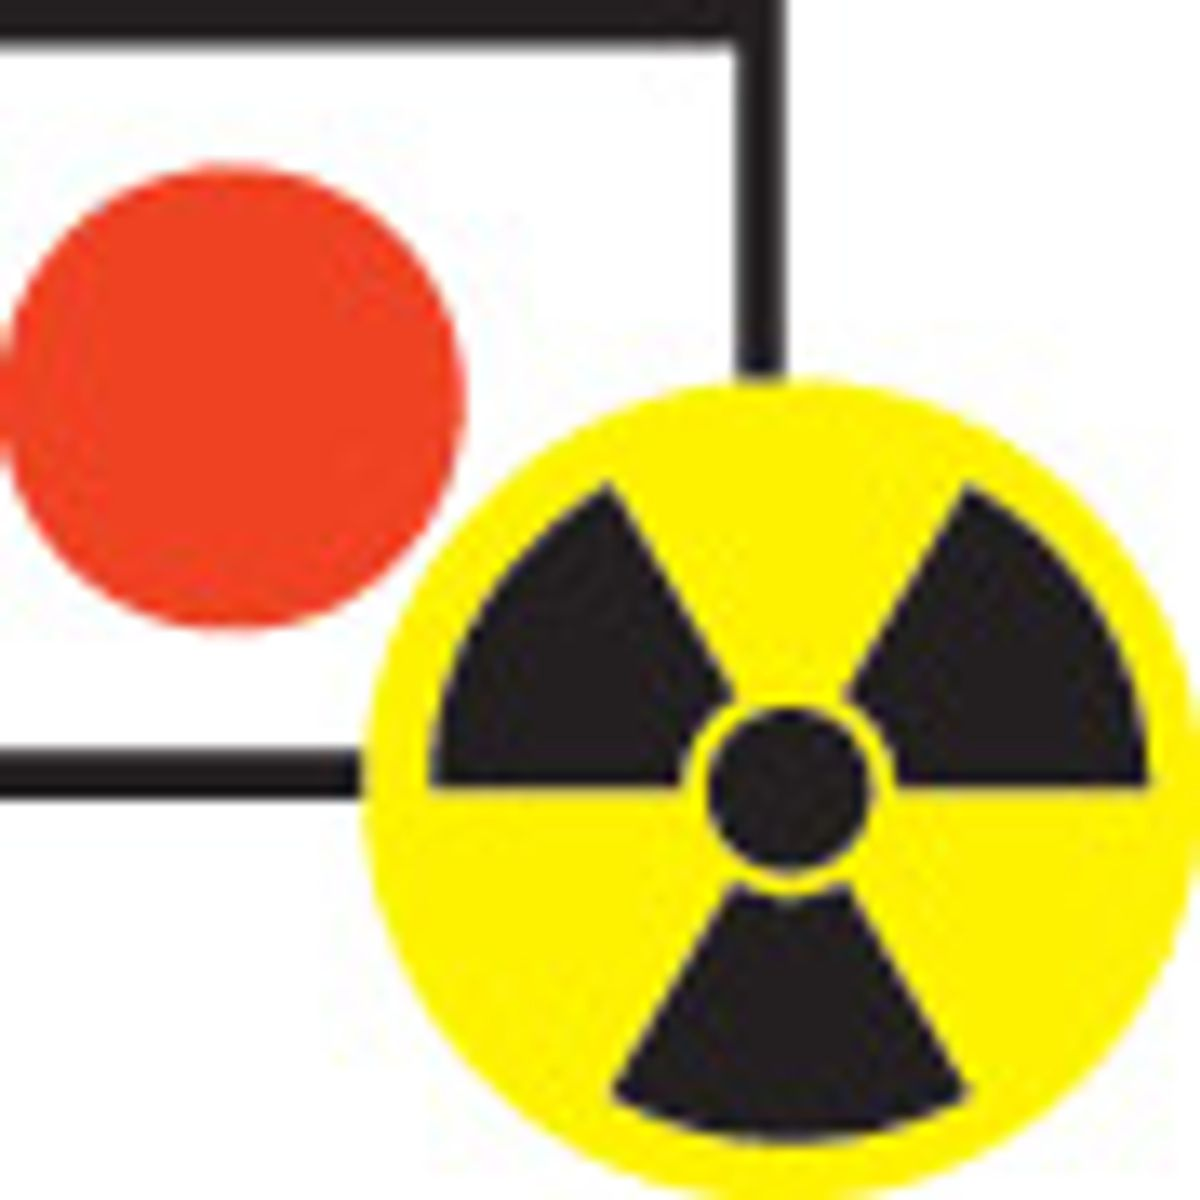 Fukushima's Impact on the Ocean Analyzed